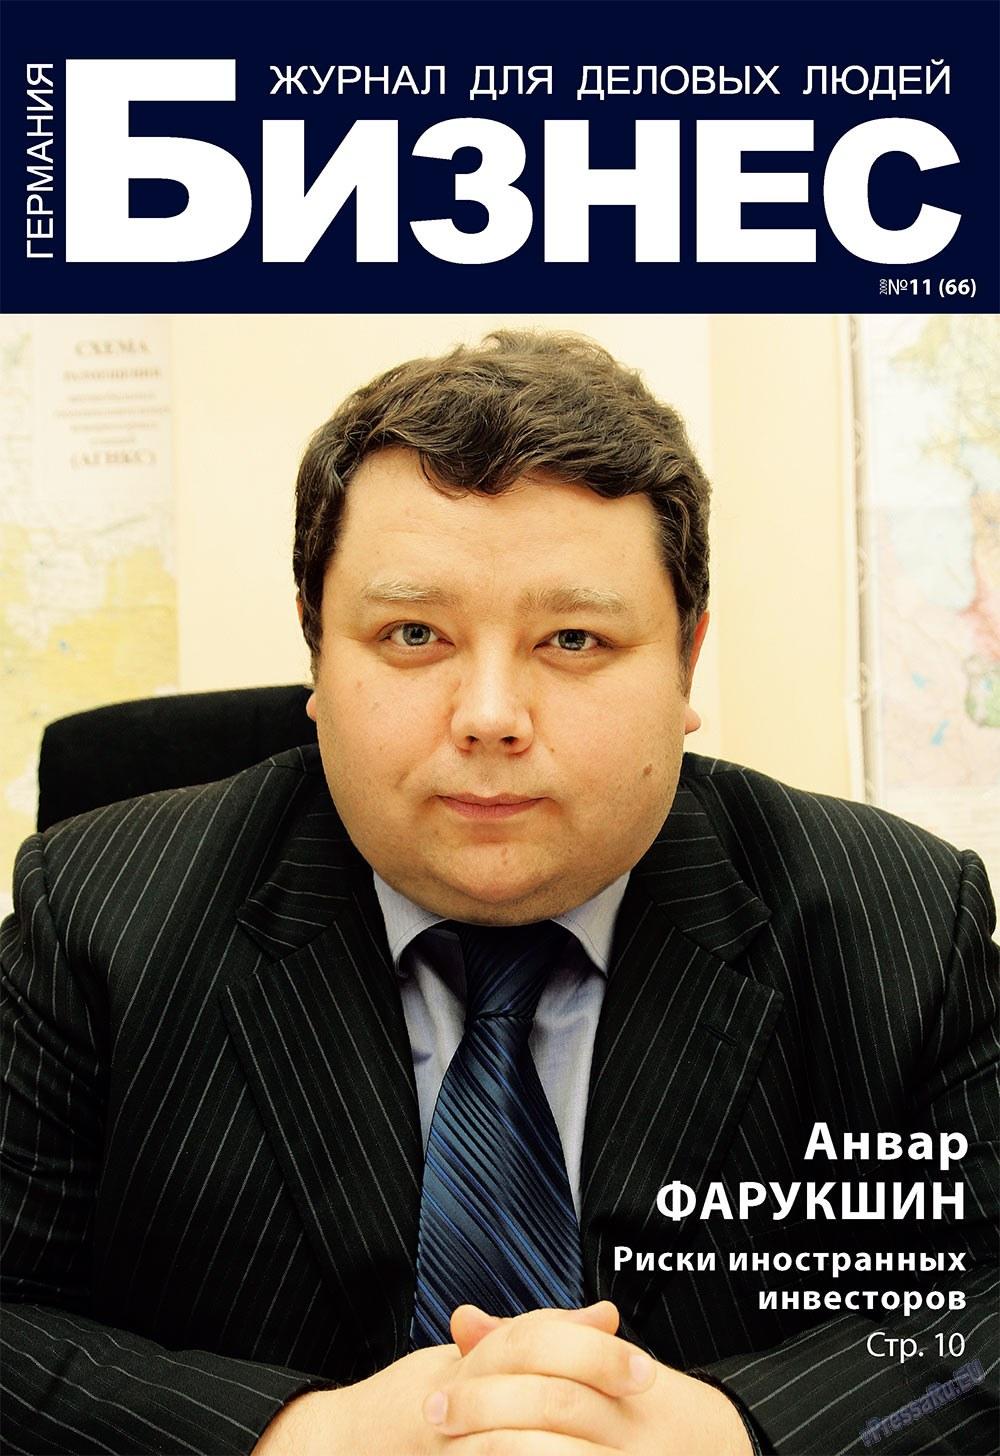 Бизнес (журнал). 2009 год, номер 11, стр. 1